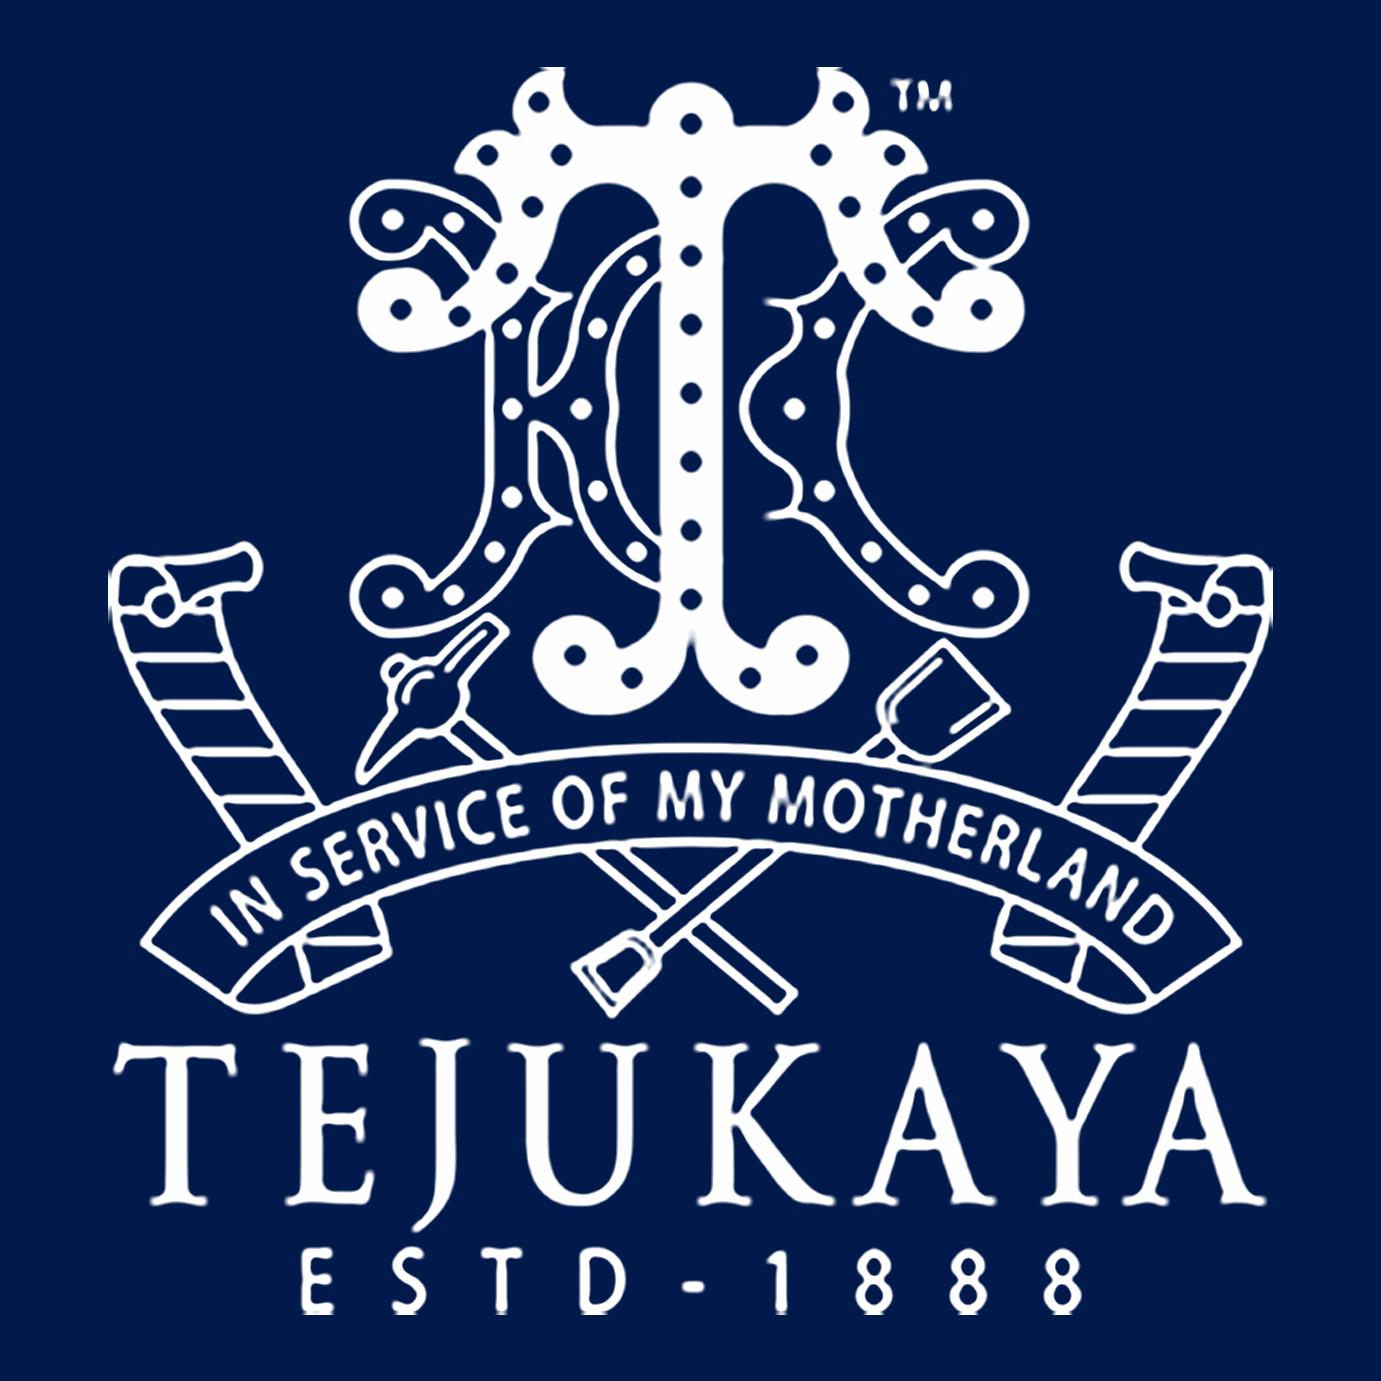 Tejukaya Group